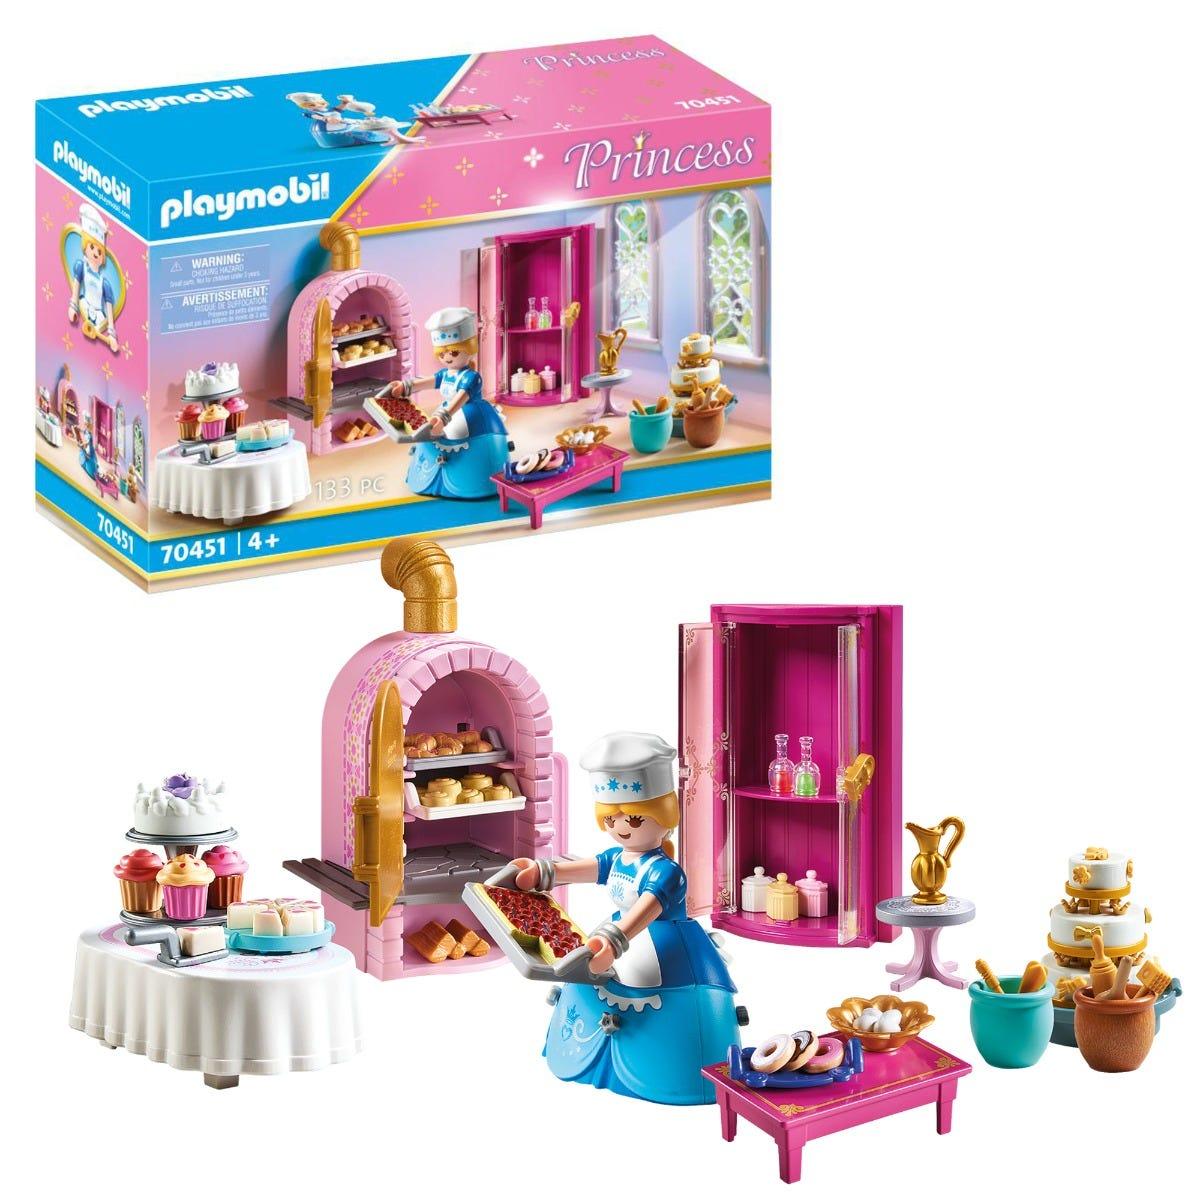 Playmobil 70451 Princess Bakery